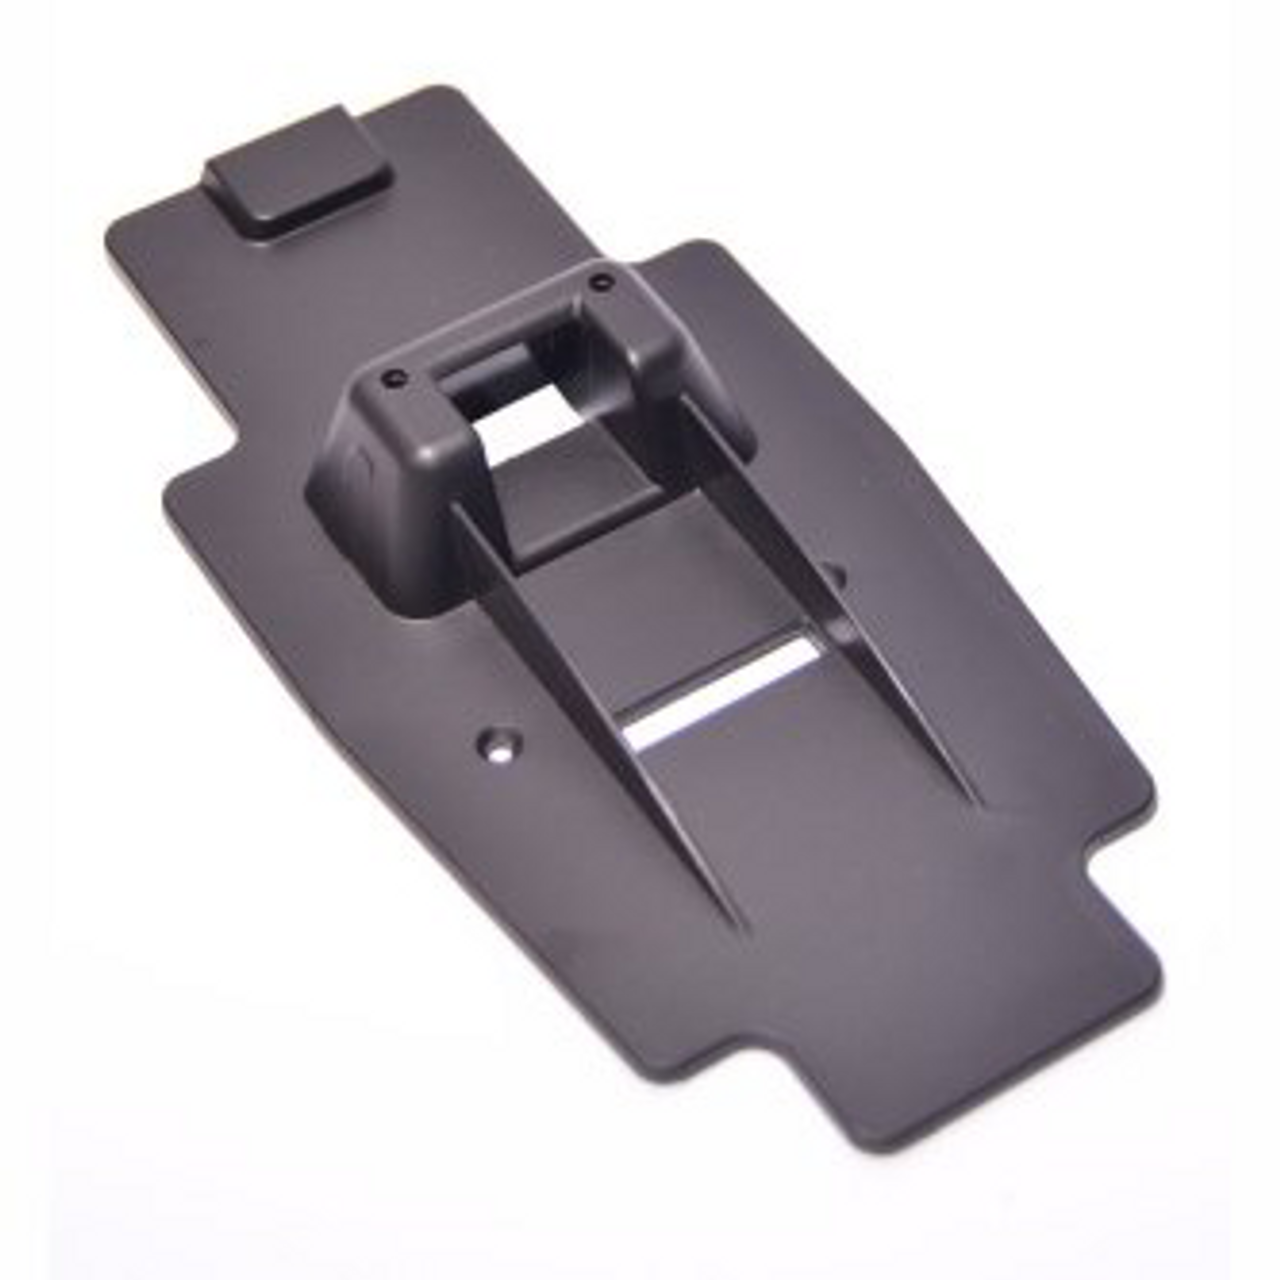 Ingenico IPP310/320/350 Backplate by Tailwind